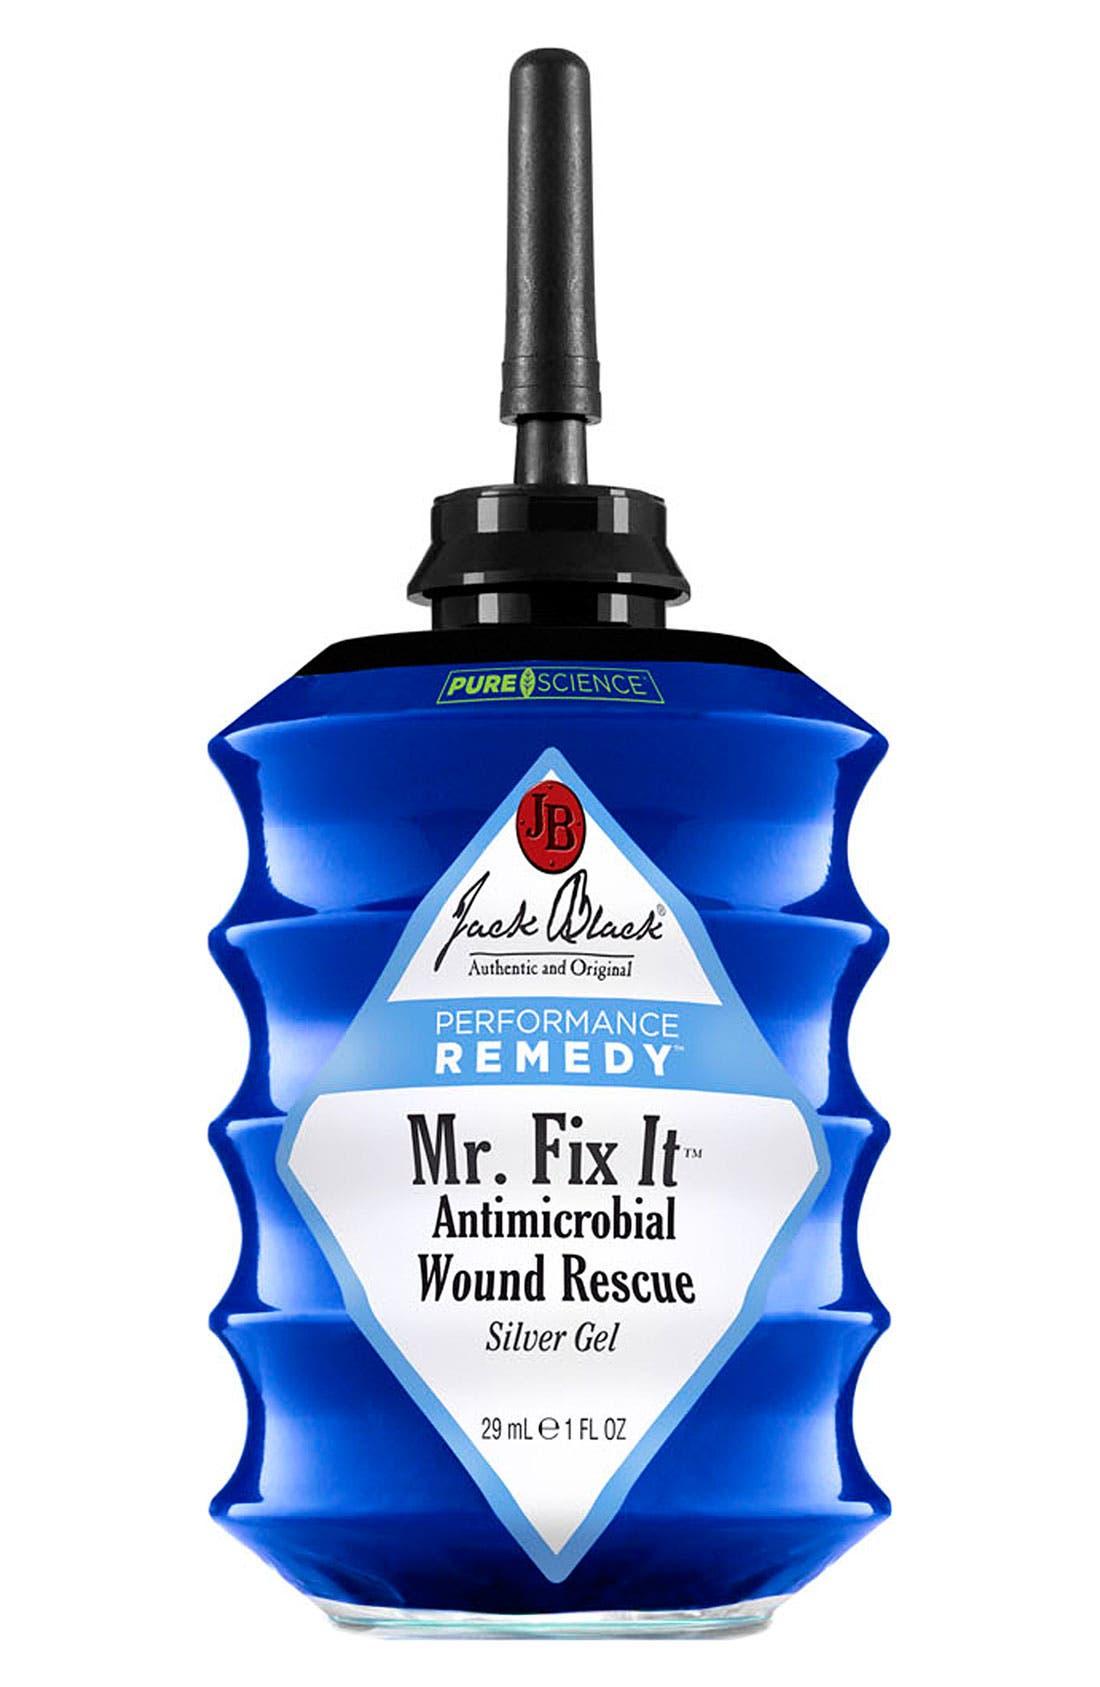 Jack Black 'Mr. Fix It' Antimicrobial Wound Rescue